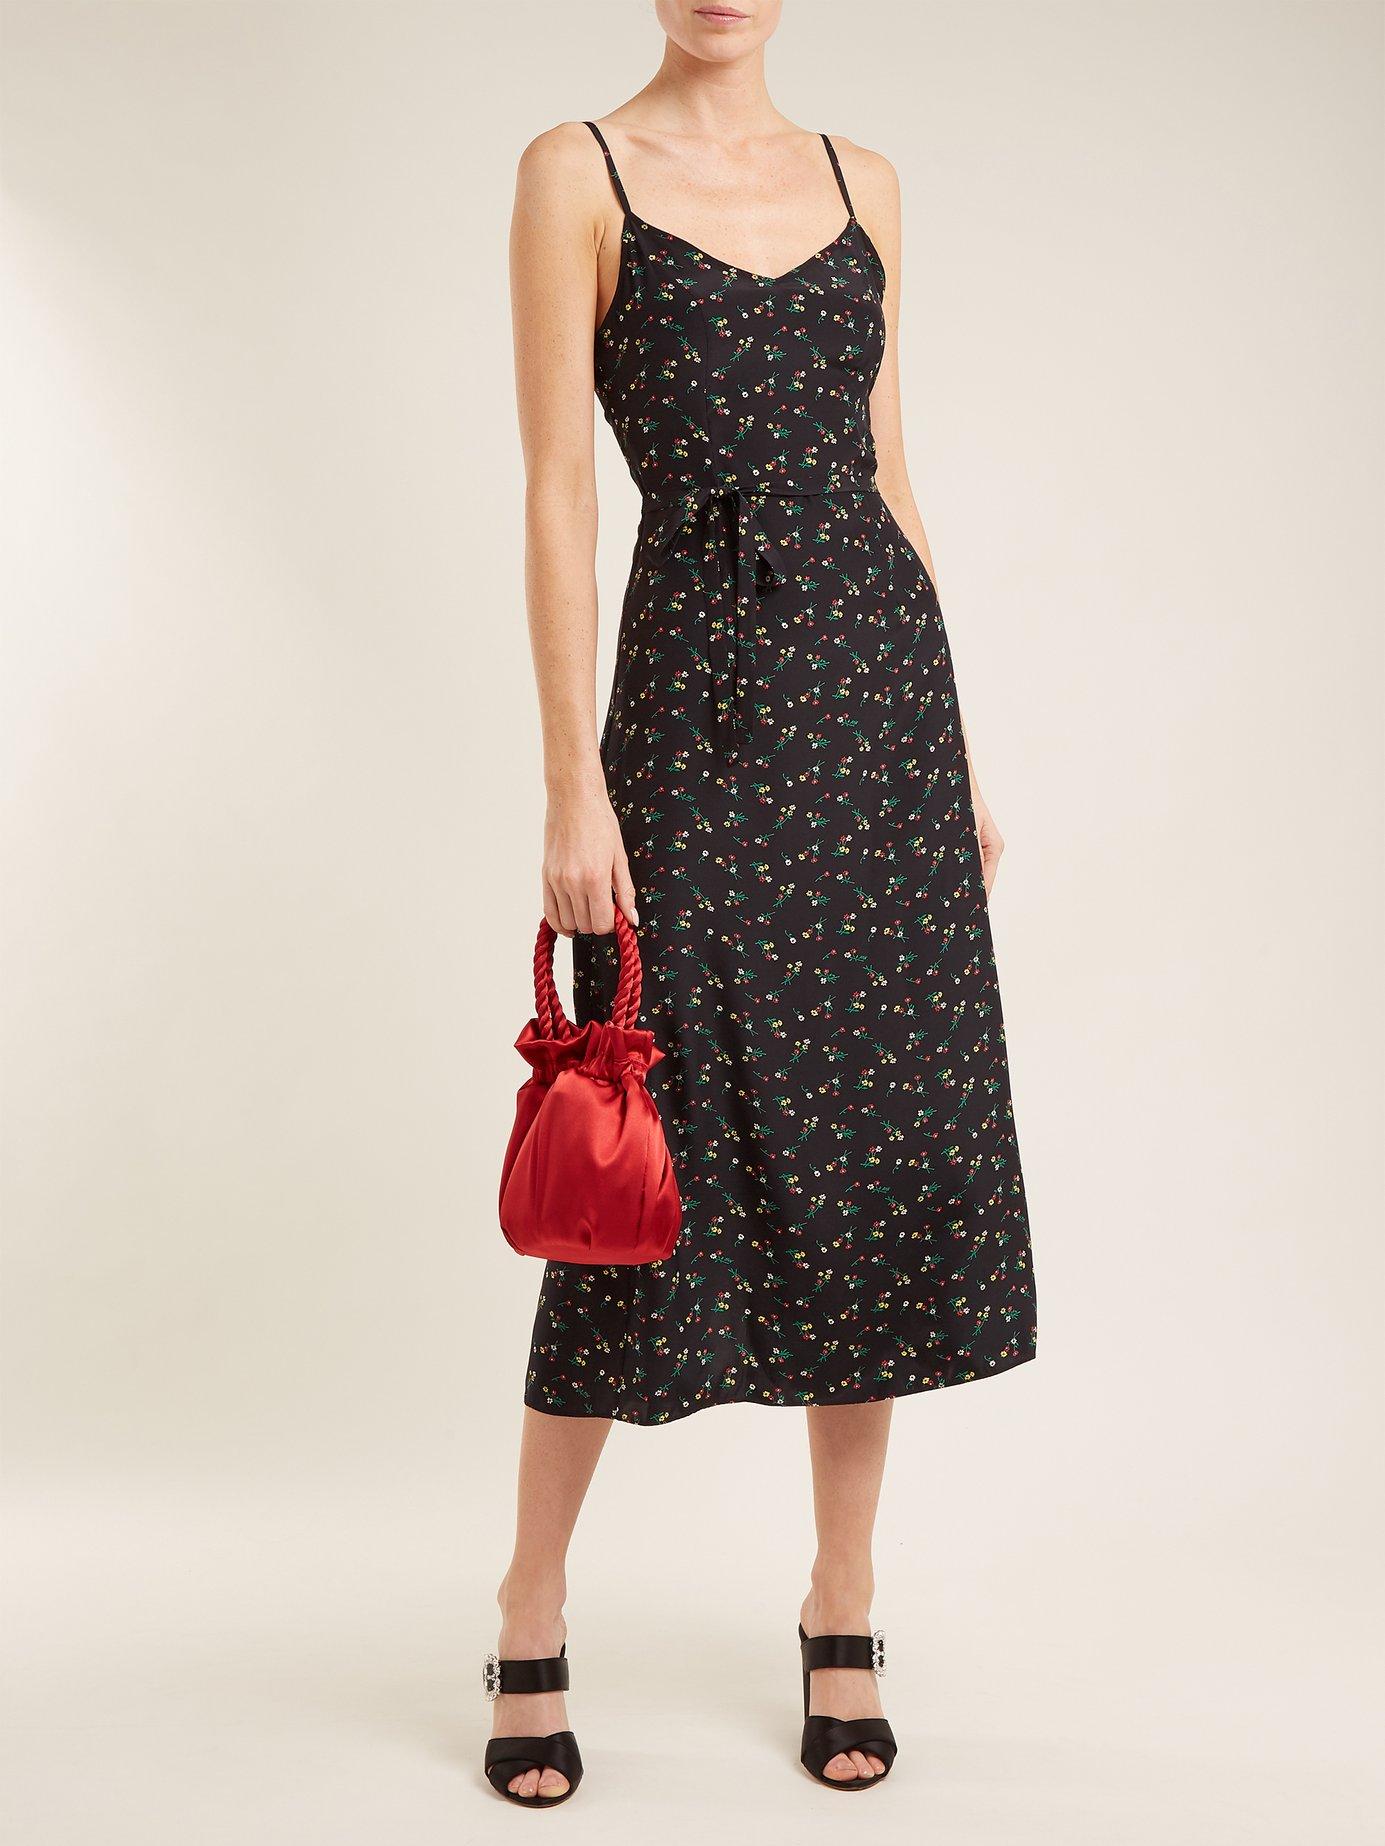 Josephine floral-print silk long dress by Hvn